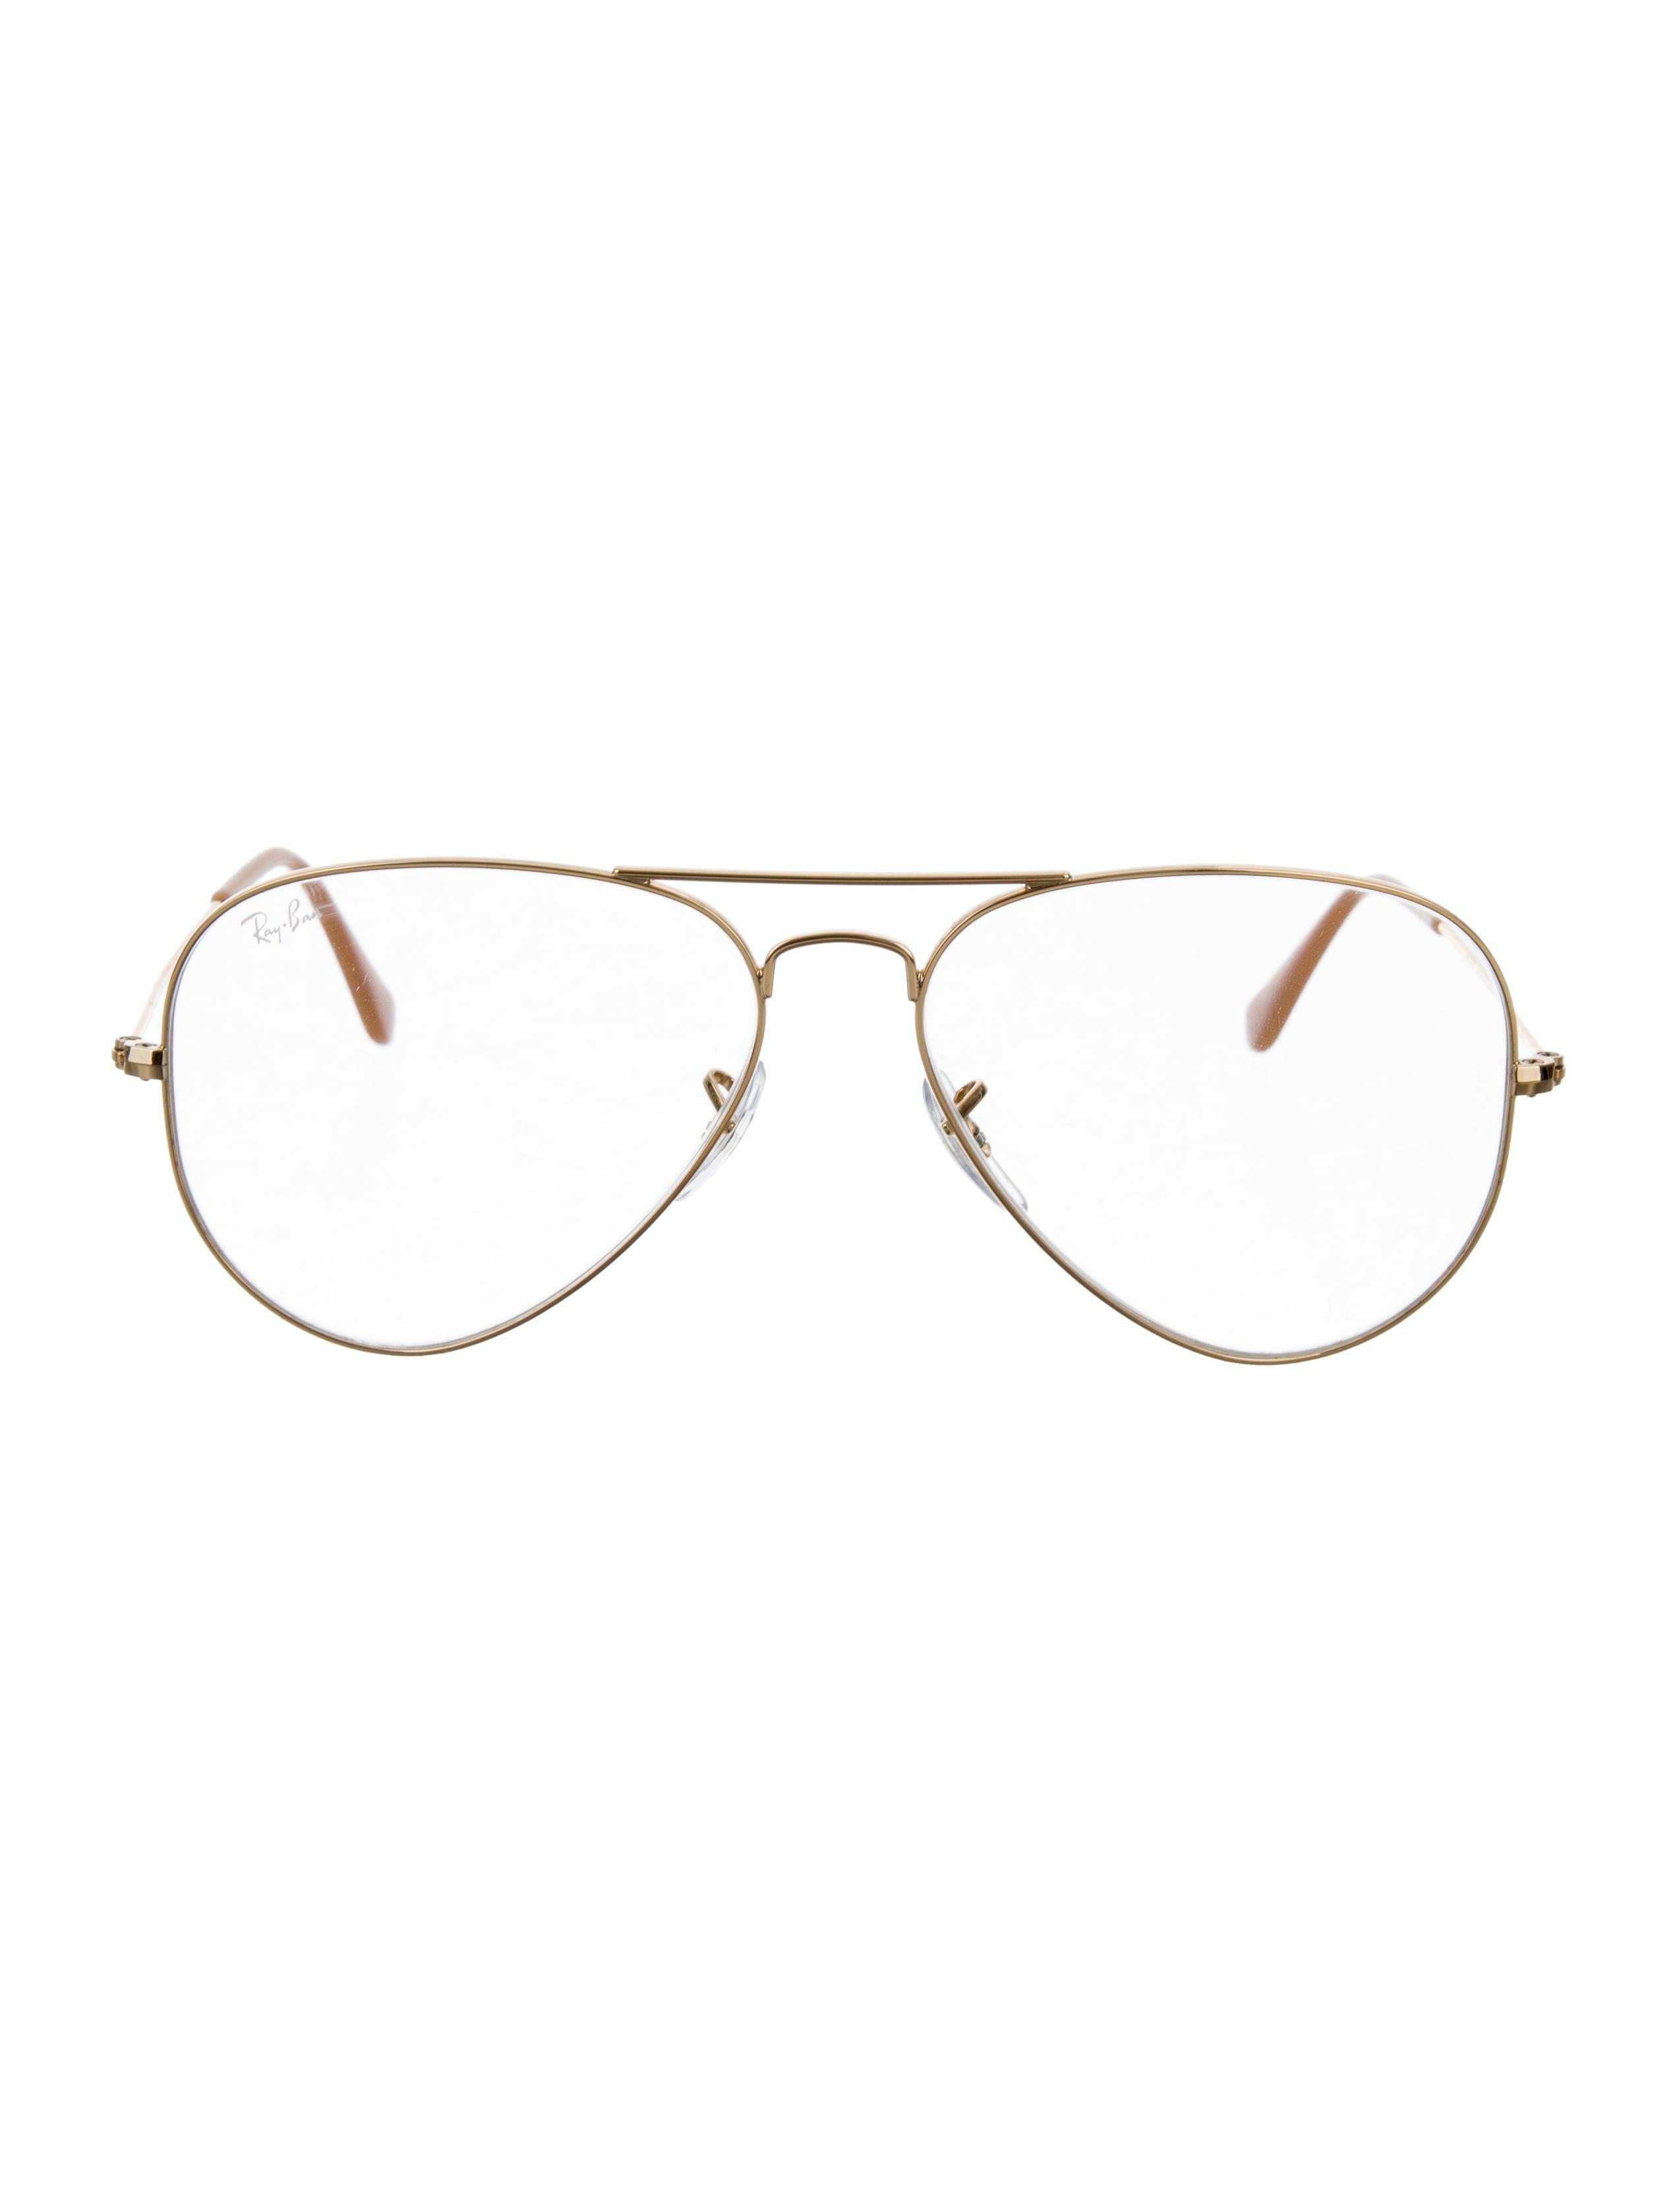 ray ban eyeglasses accessories la conf d ration nationale du logement RB8307 002 Aviator ray ban eyeglasses accessories